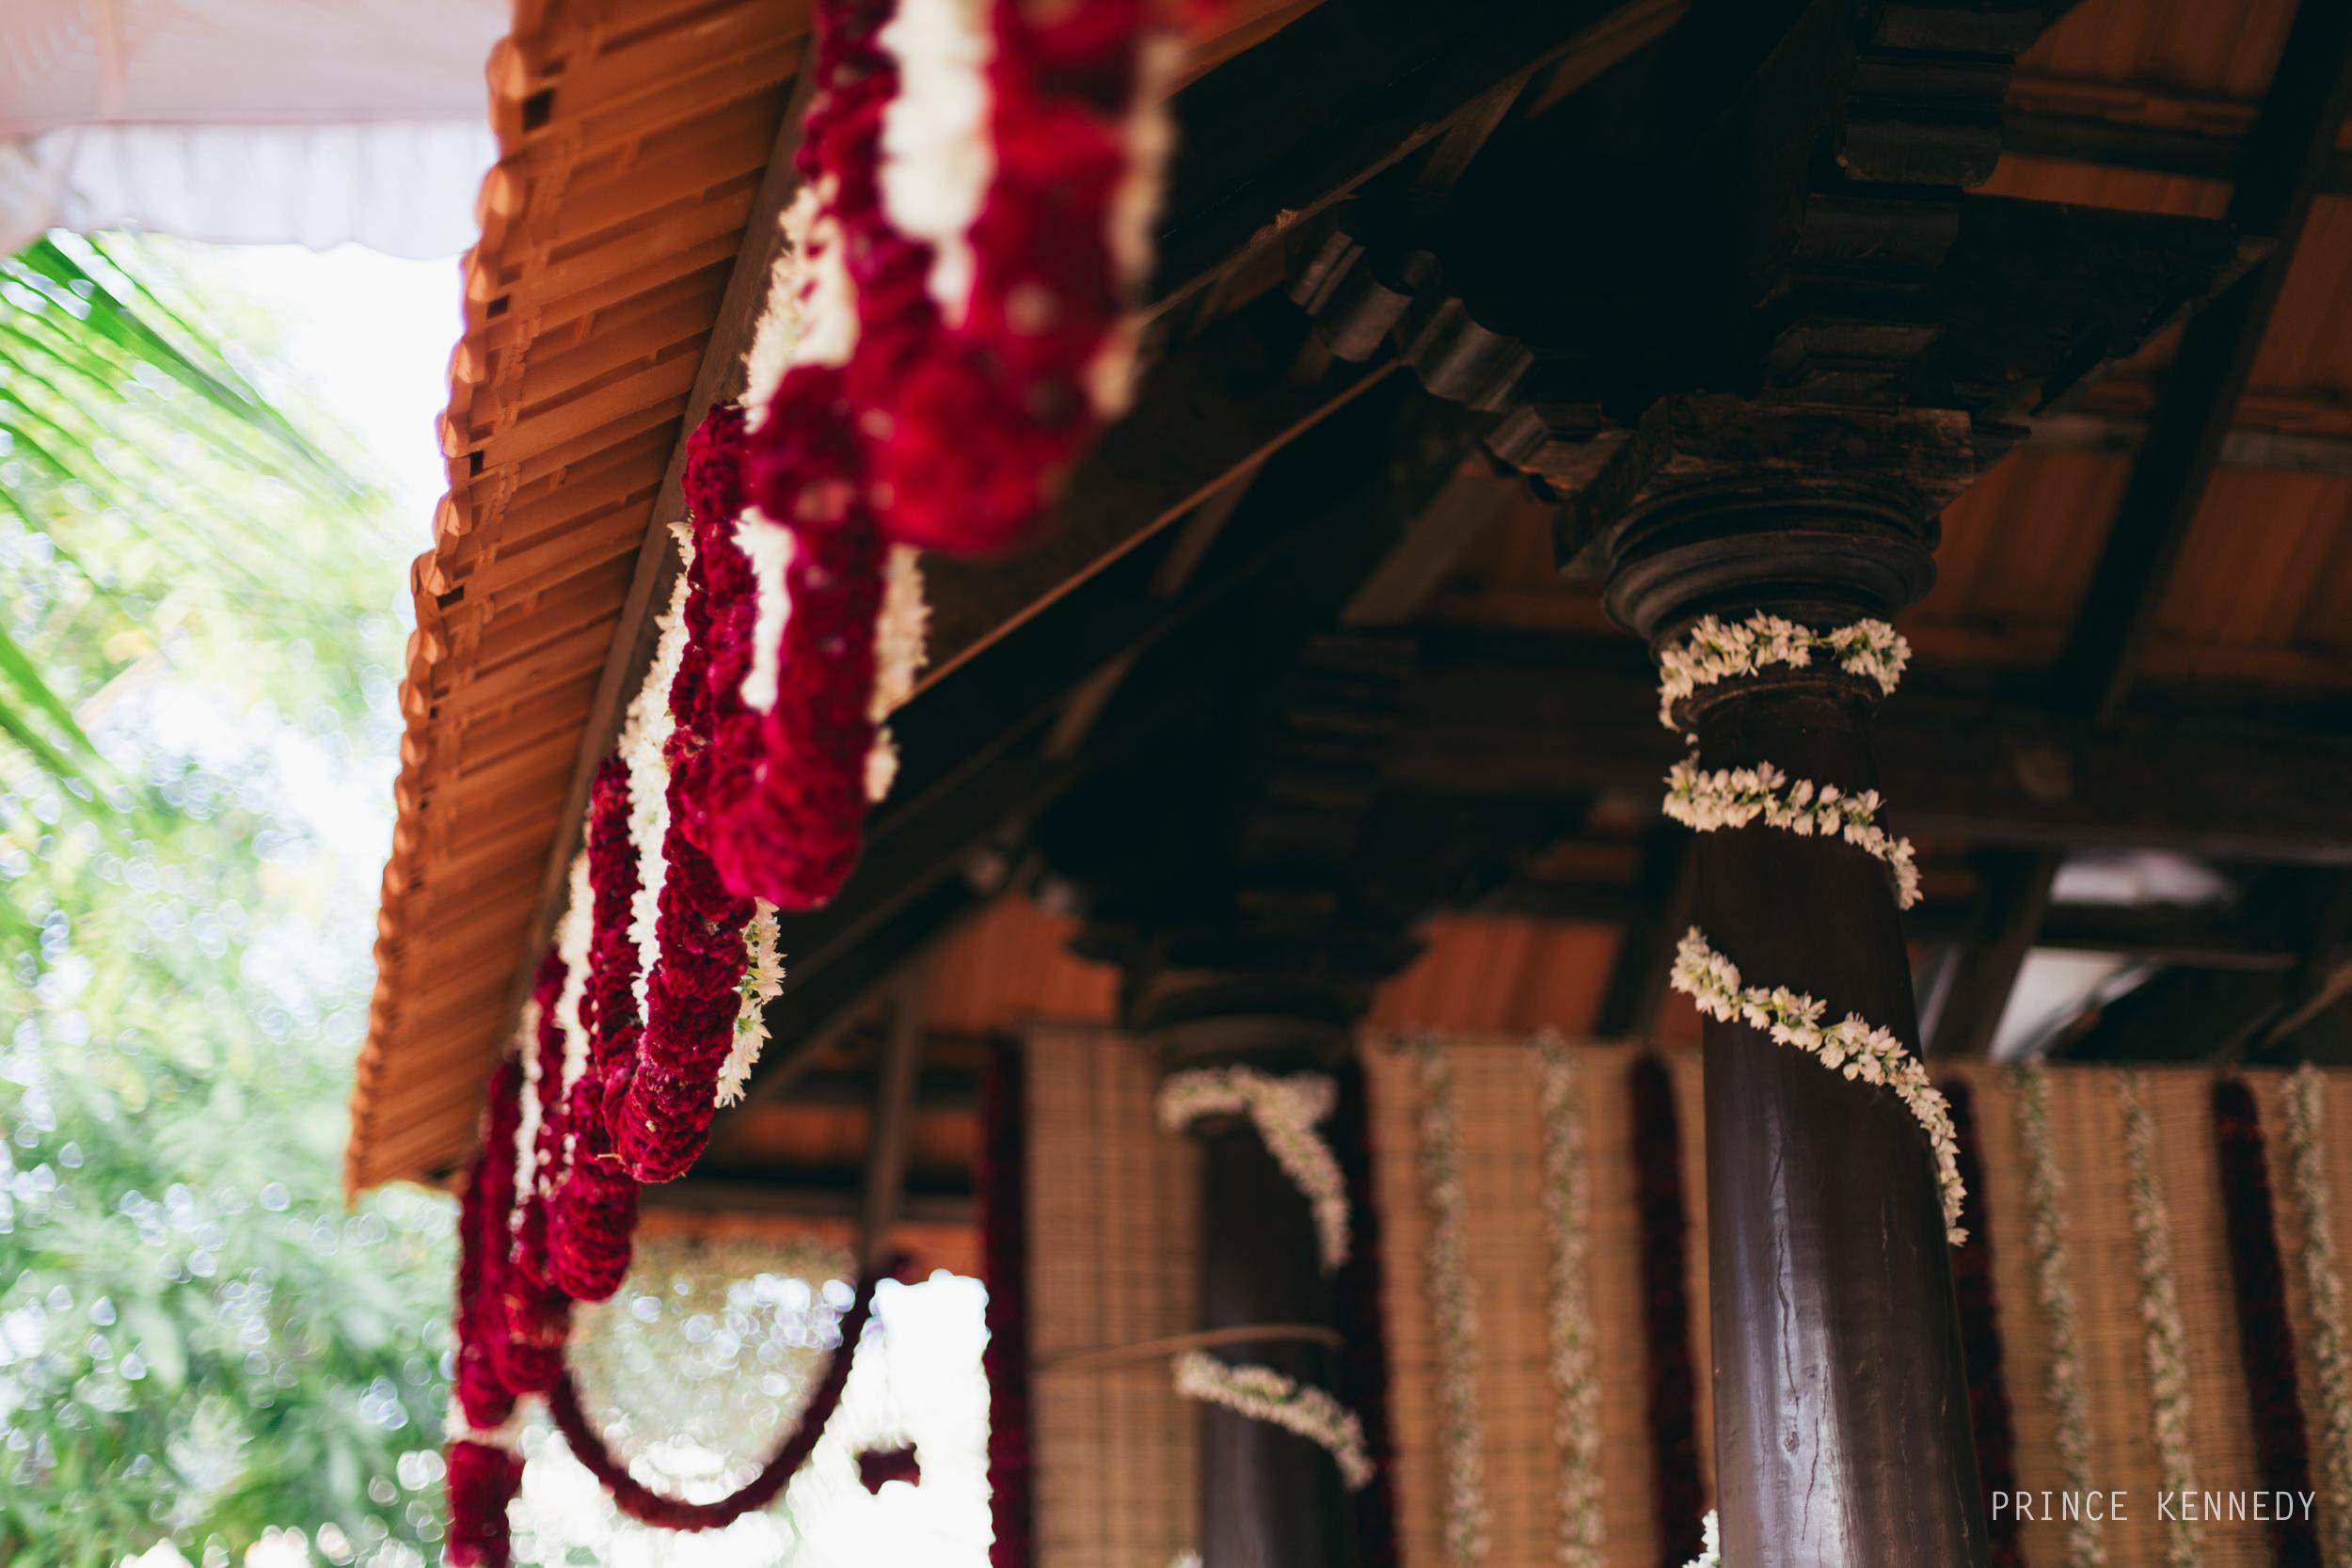 Athmajja-Nithesh-Engagement-Couple-Portrait-Portraiture-Wedding-Couple-Portrait-Chennai-Photographer-Candid-Photography-Destination-Best-Prince-Kennedy-Photography-2.jpg